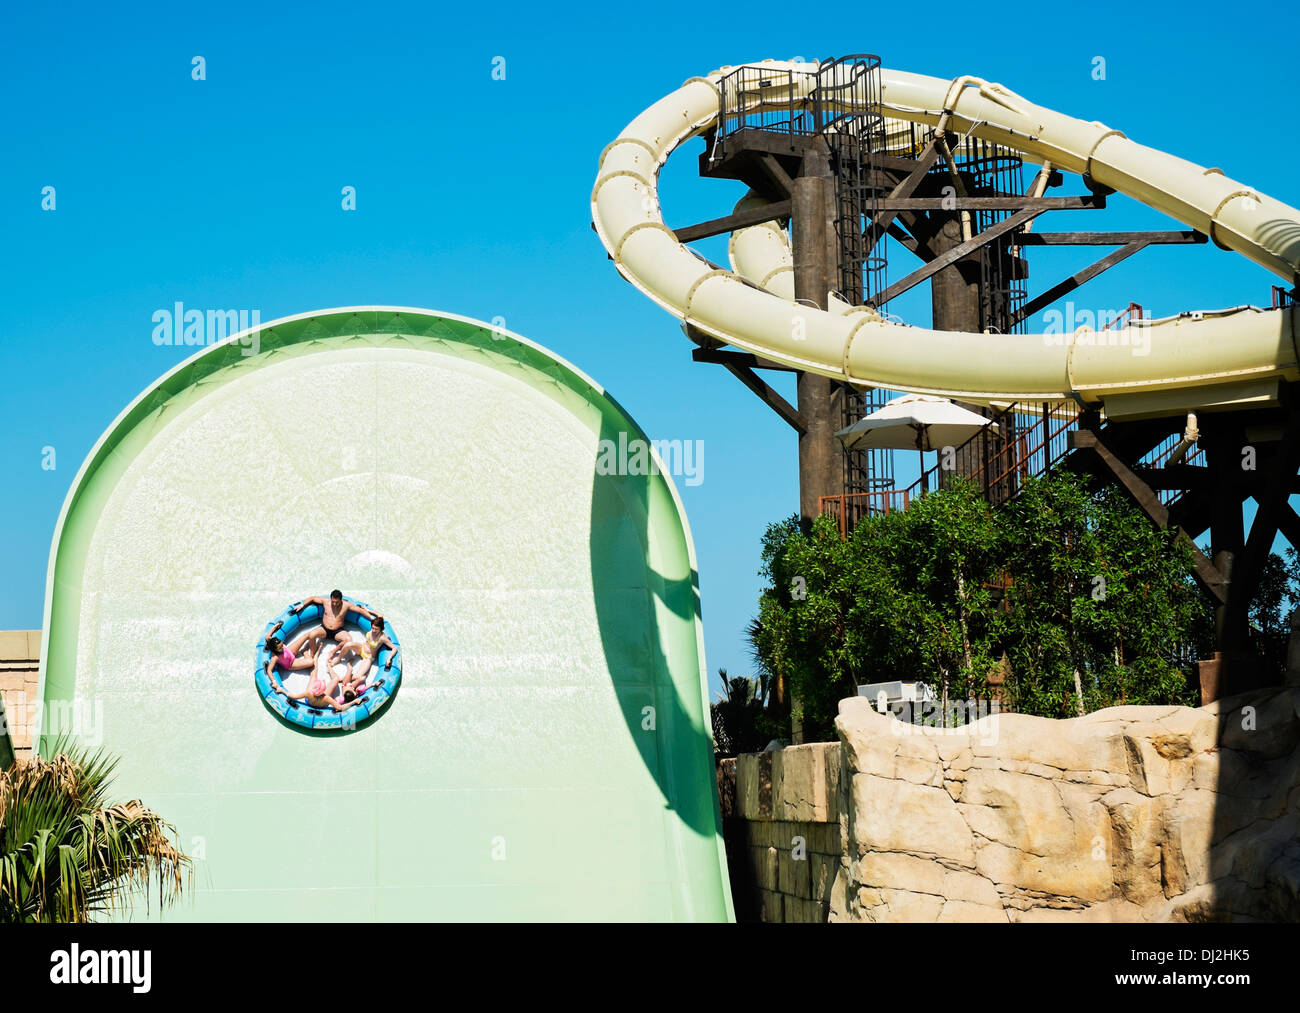 Aquaconda Waterslide At The Tower Of Poseidon Aquaventure Water Park Atlantis Hotel On Palm Island Dubai